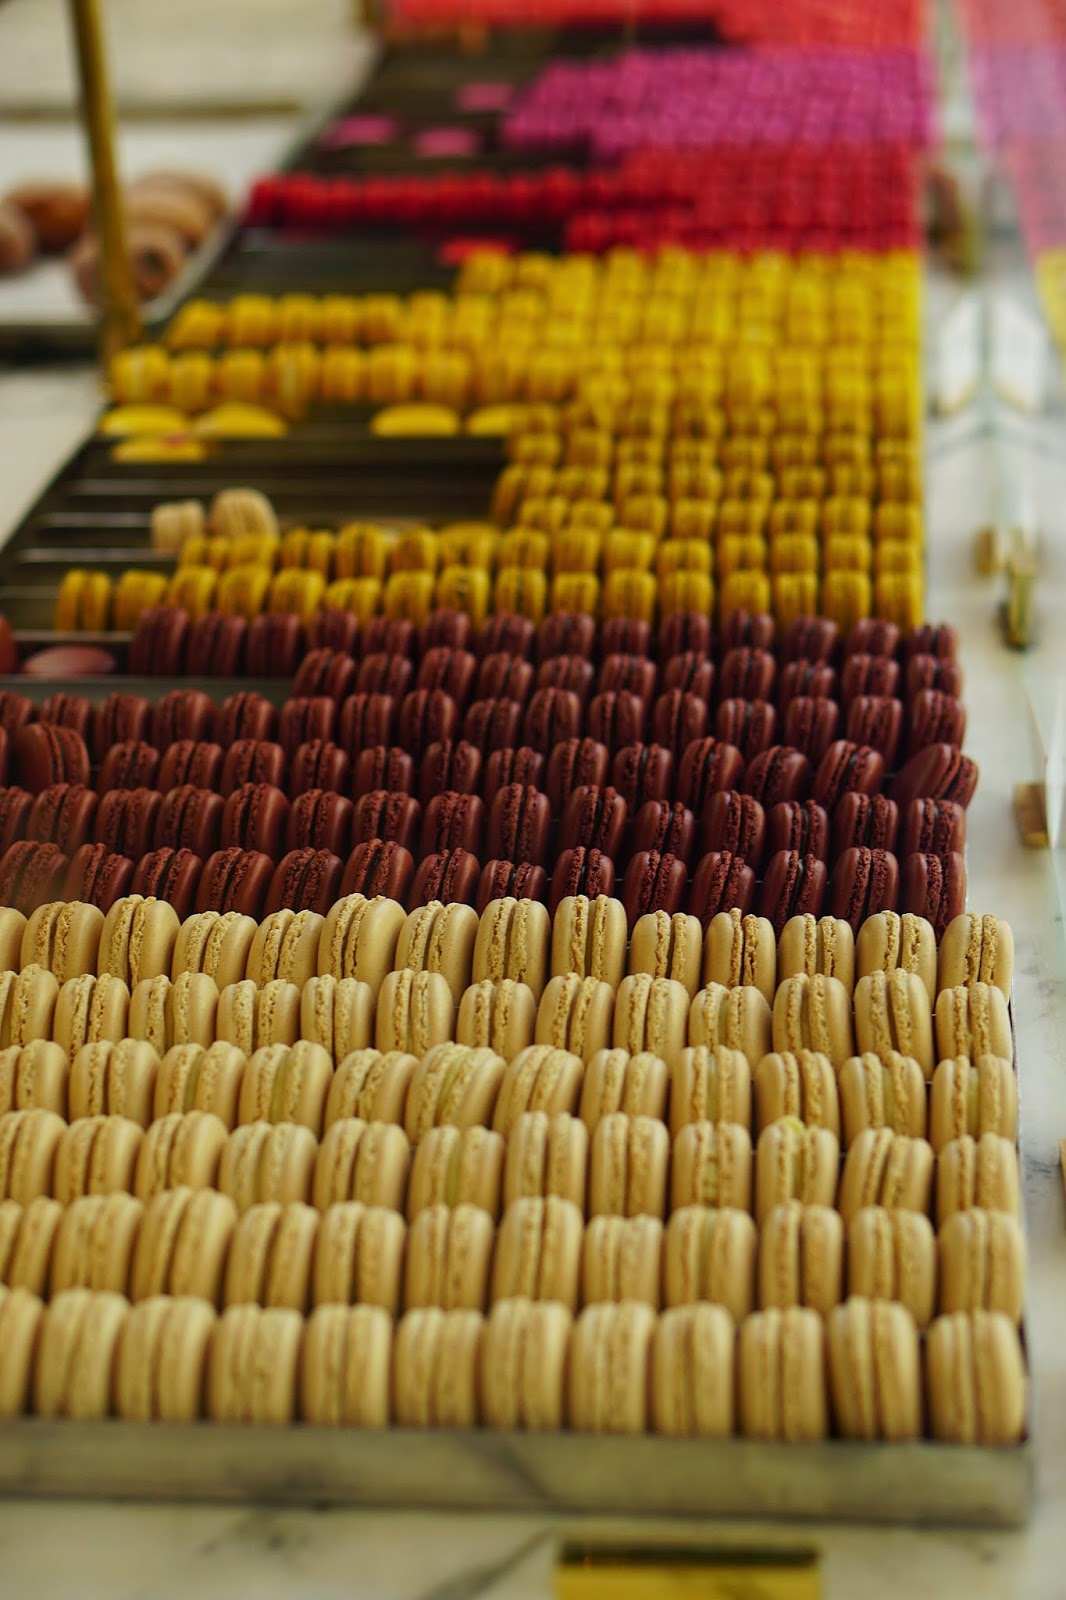 Bottega Louise, Los Angeles Hot Spot, Best Desserts In Los Angeles, Macaroons, Colorful Macaroons